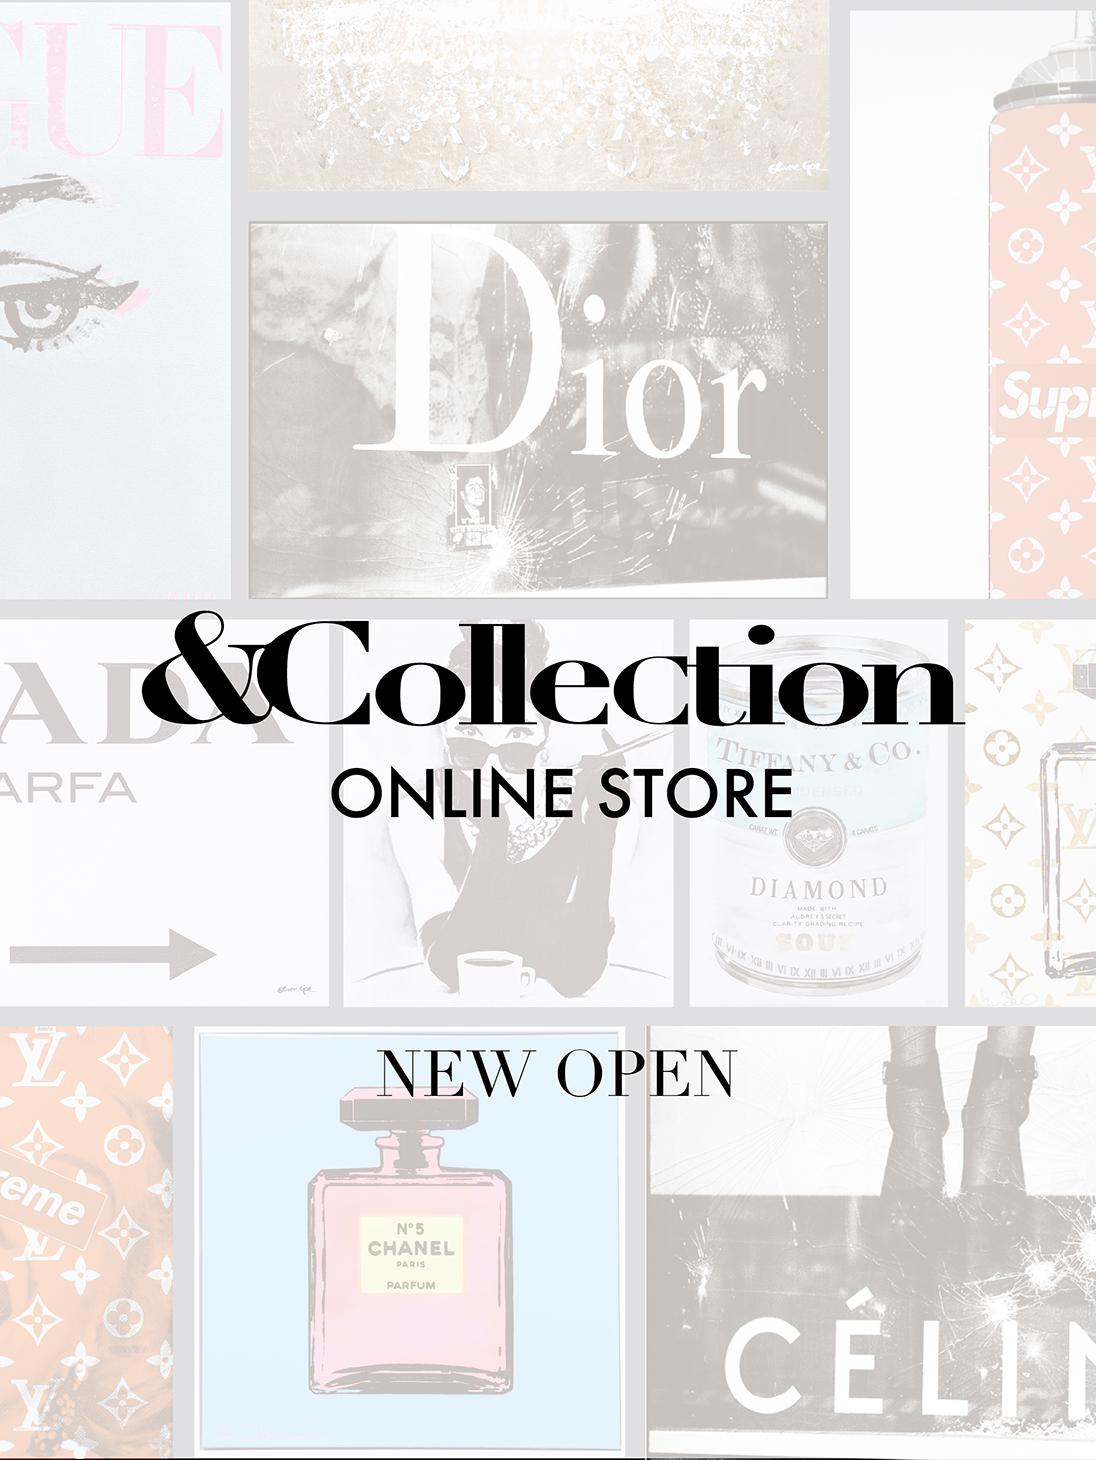 【NEWS】&Collection ONLINE STOREオープン!